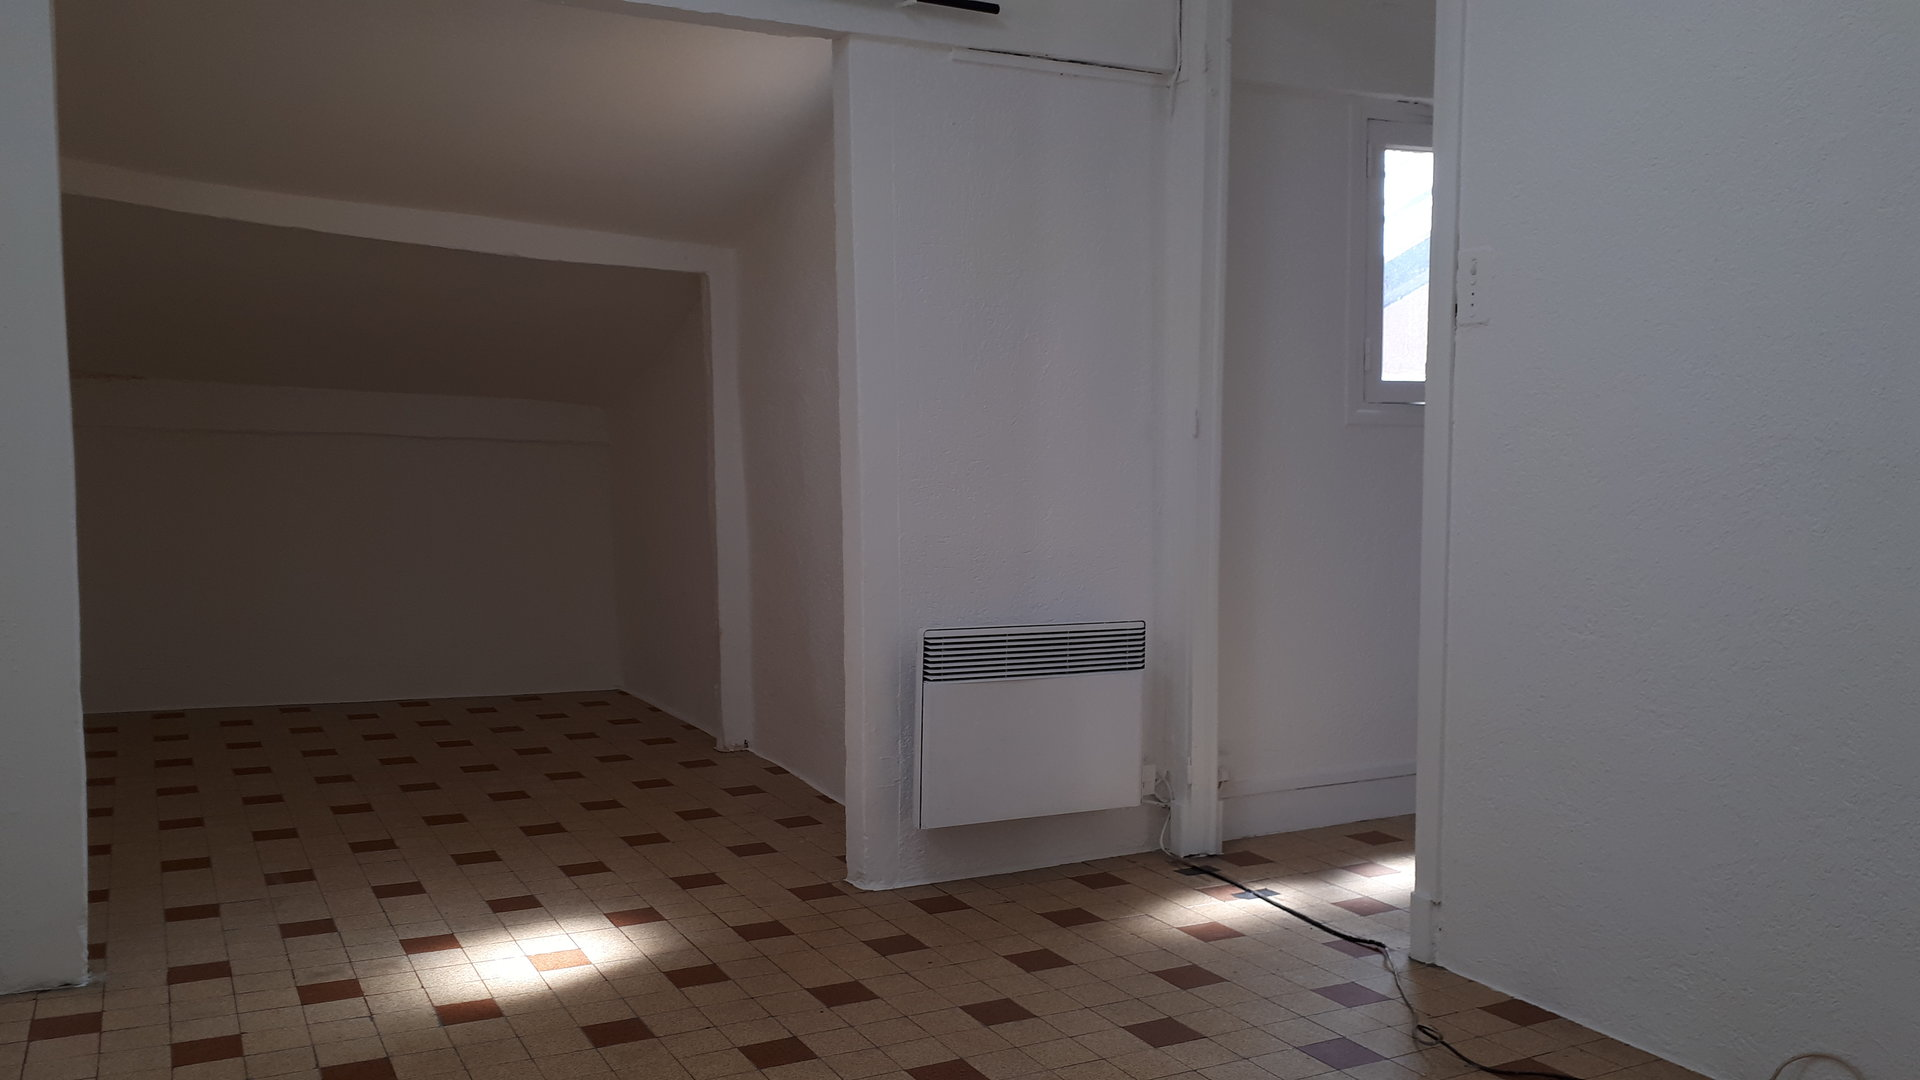 location Nice, studio 20.30 m² secteur Vieux Nice